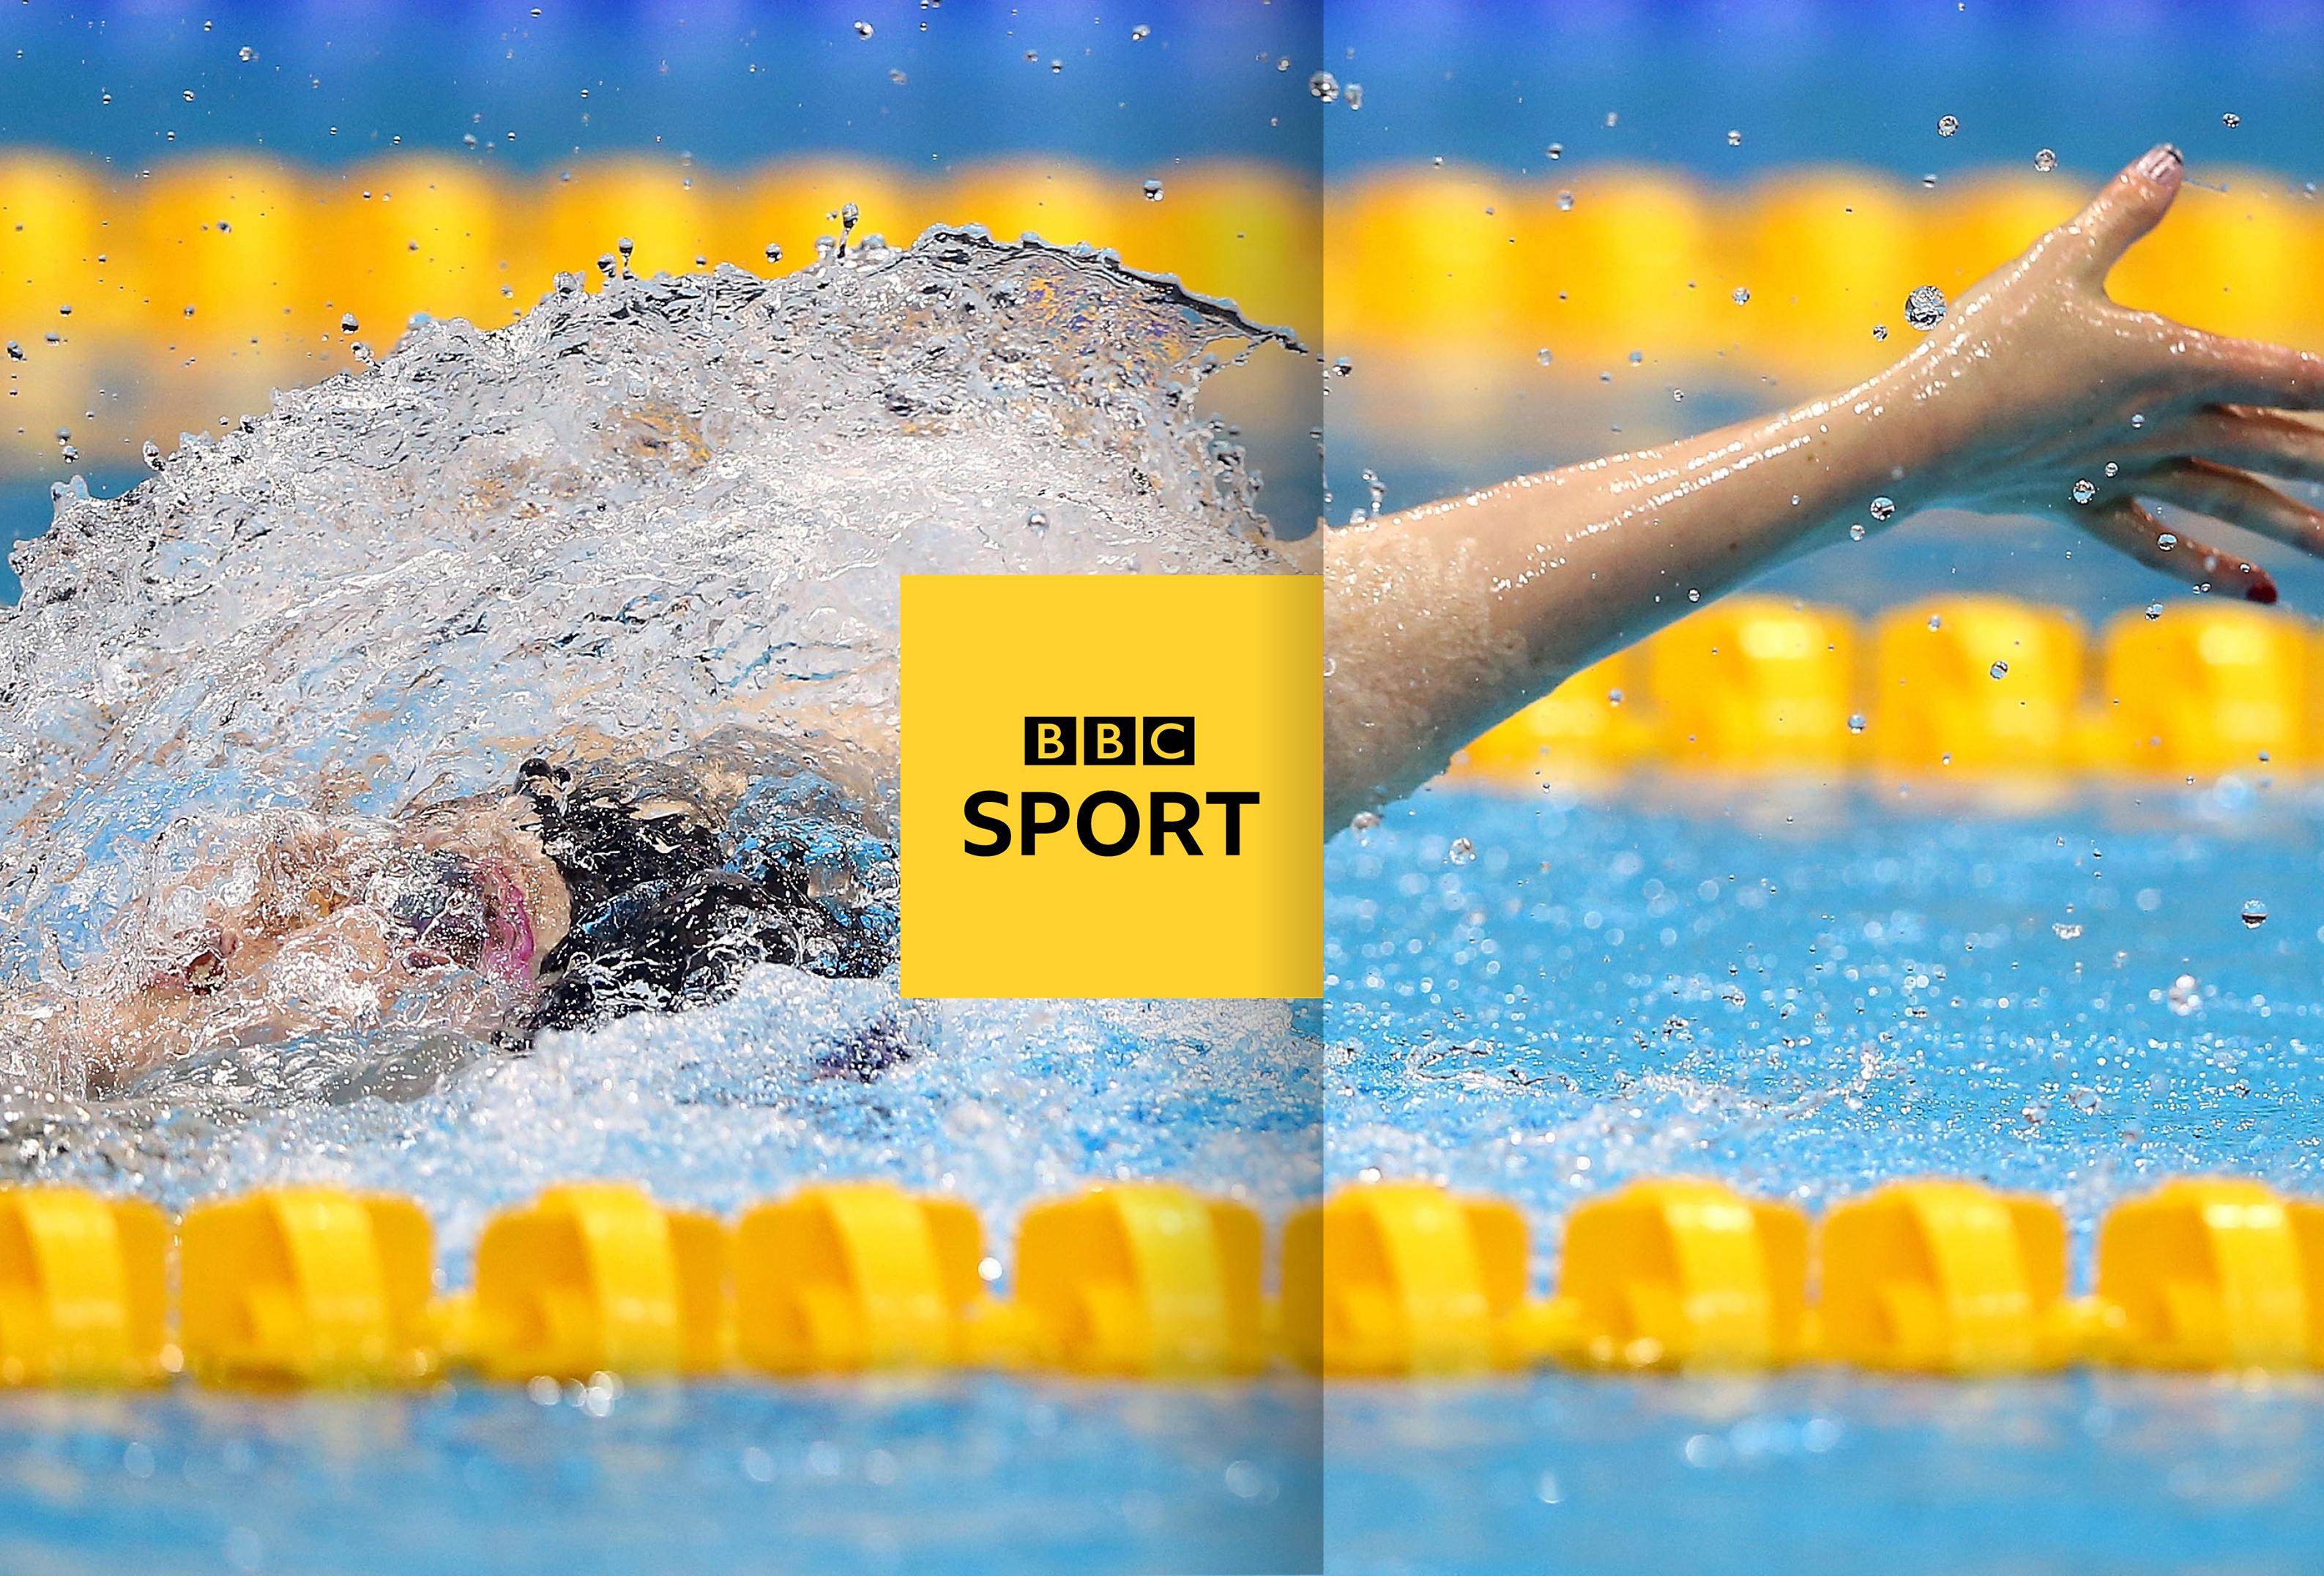 ncs_bbc-sport-rebrand_0011